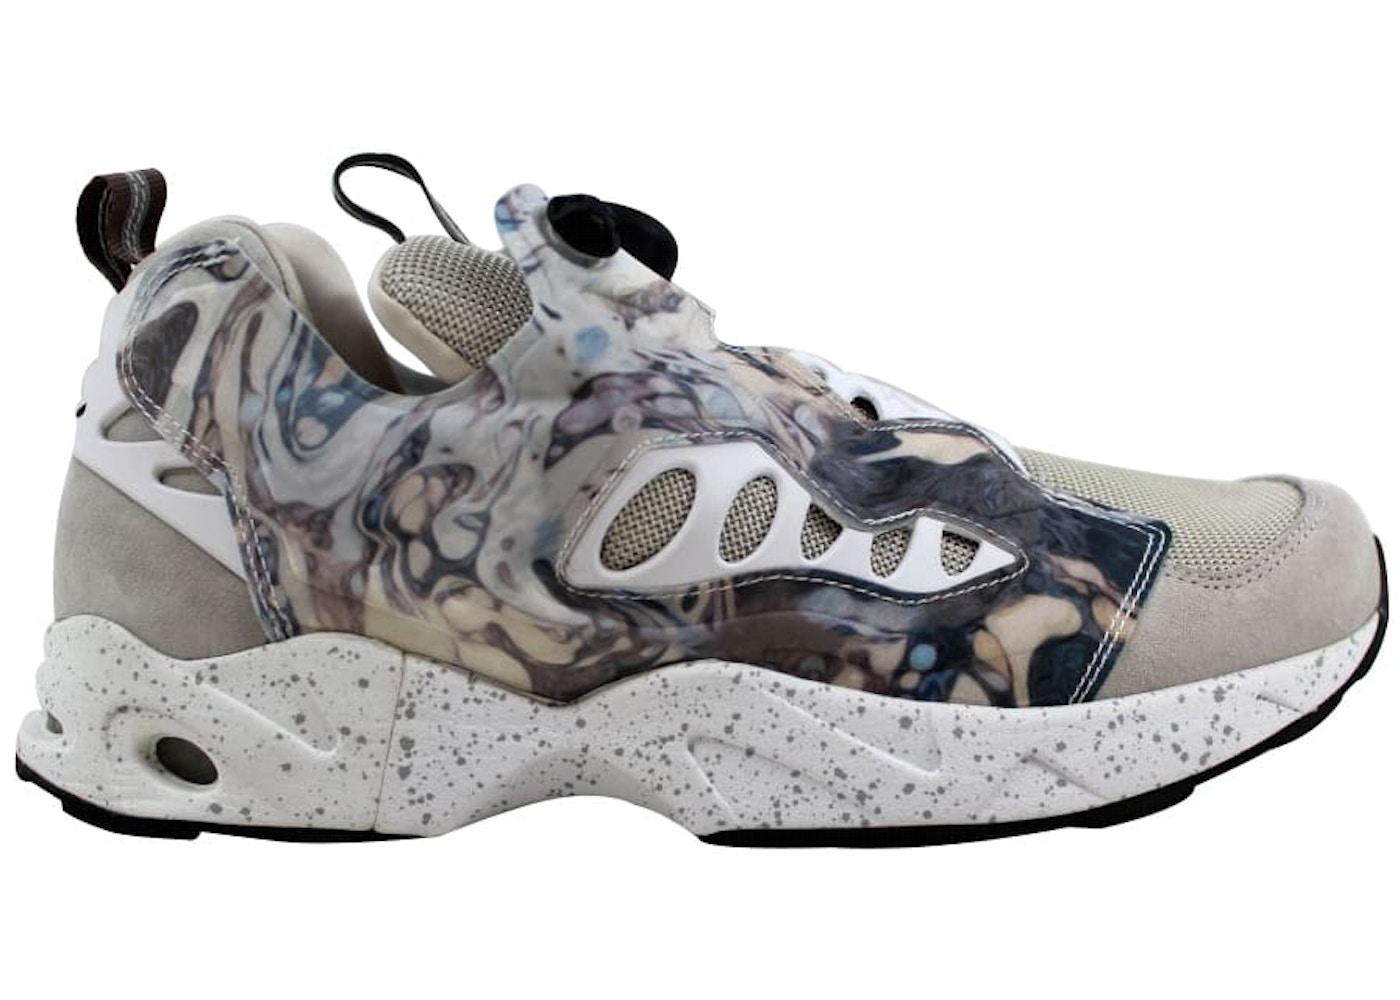 d4622771b0a Reebok Size 13 Shoes - Lowest Ask